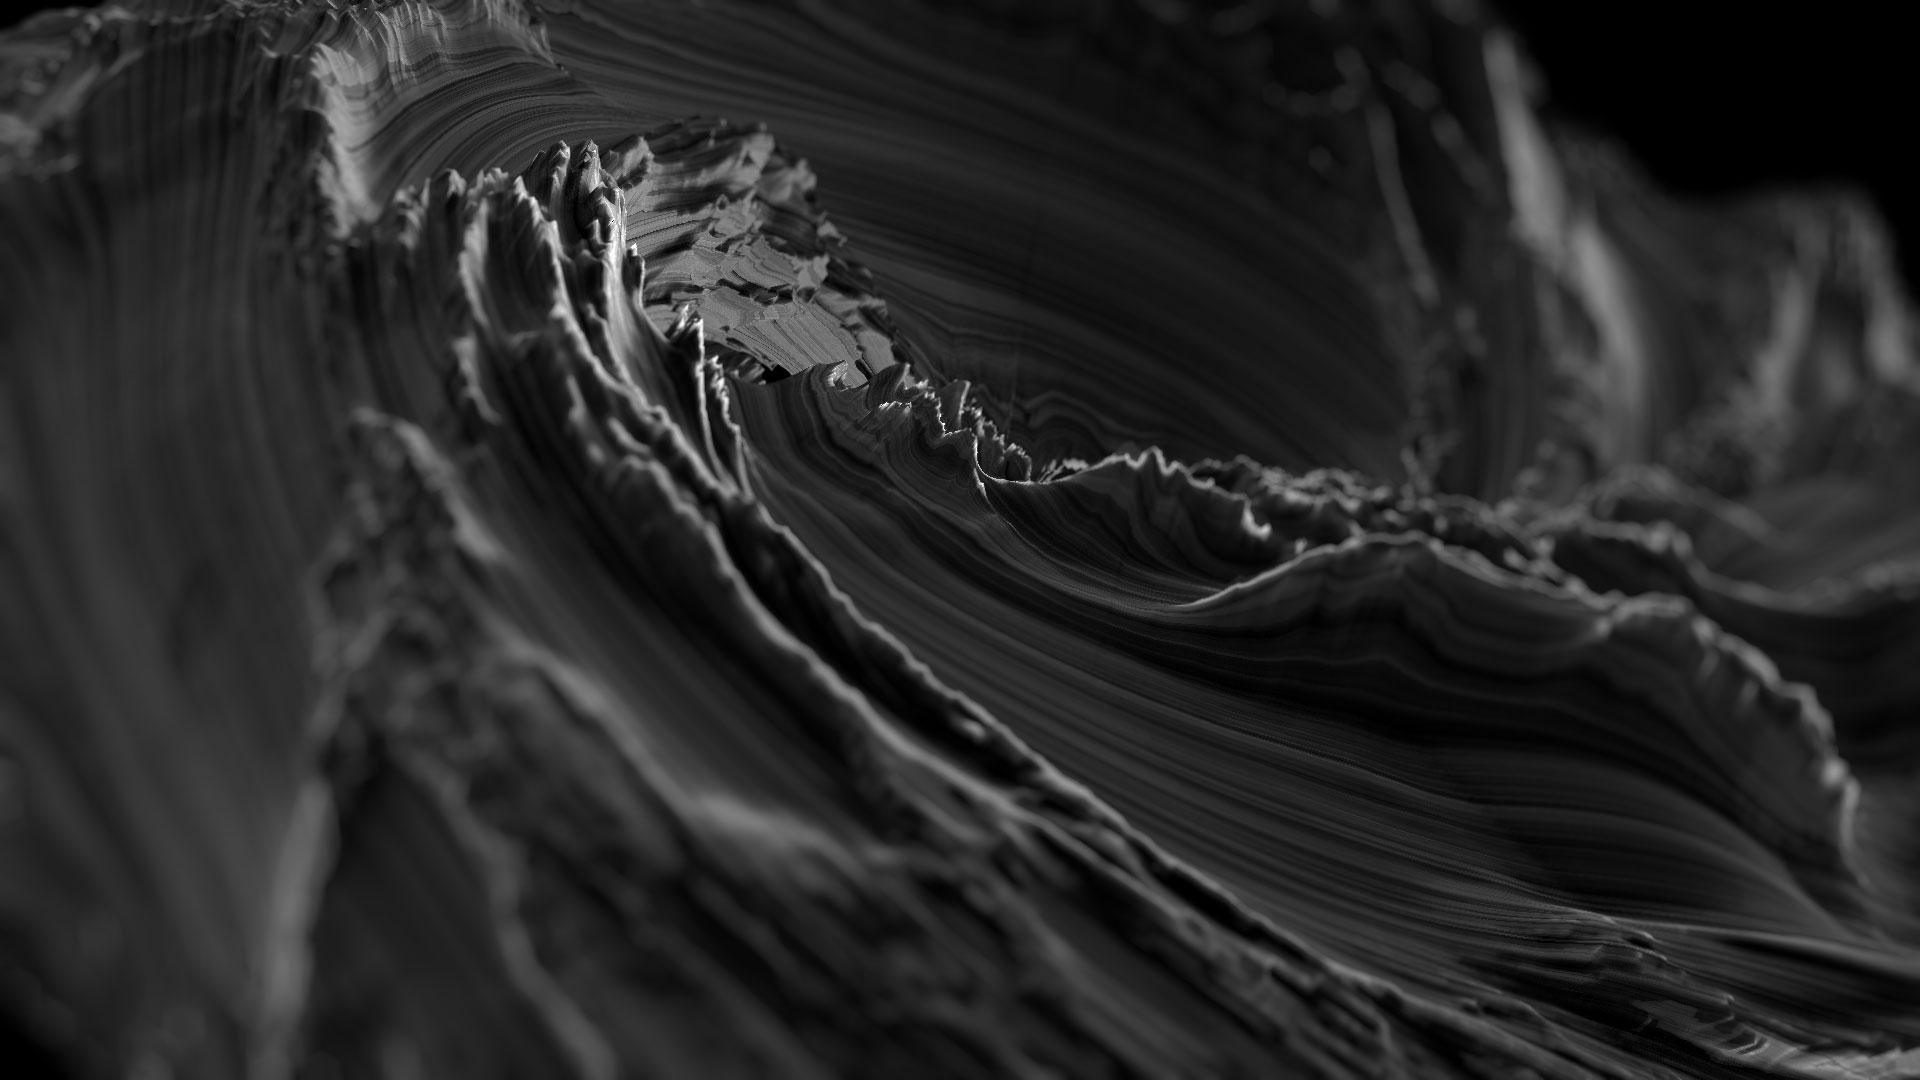 tao-maelstrom-(0-00-00-00)_1.jpg